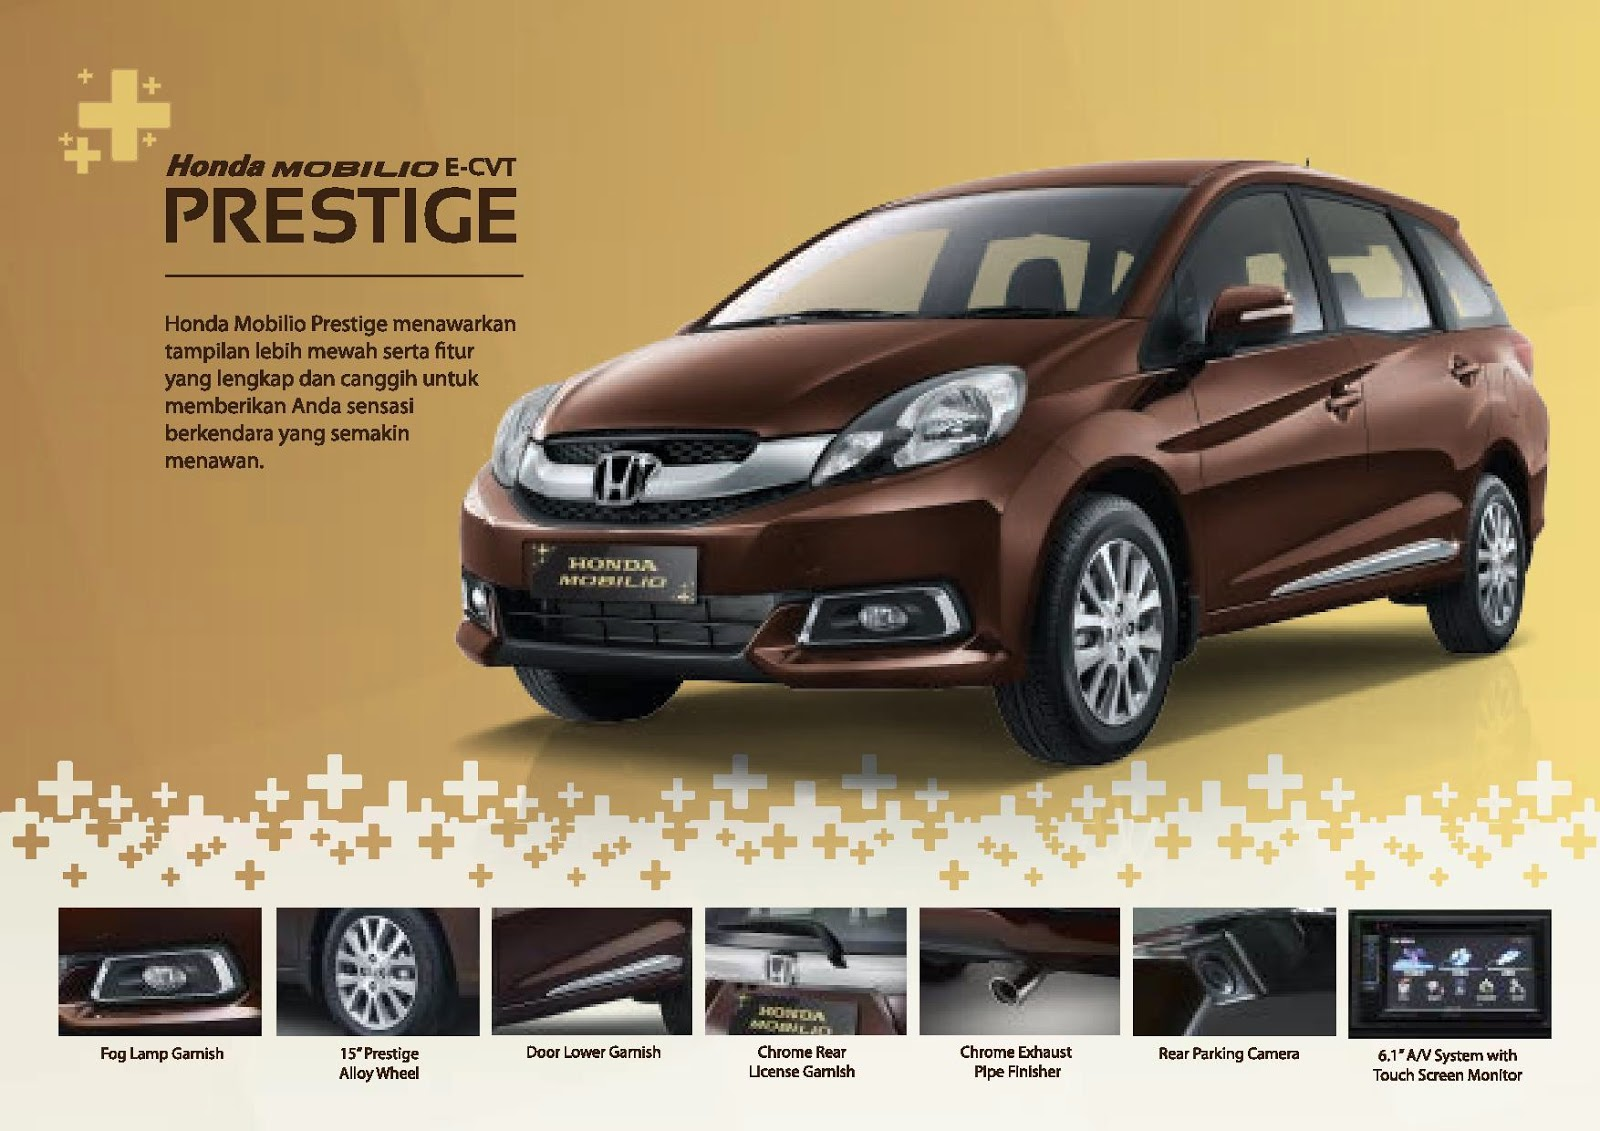 Honda Mobilio Jenis Prestige